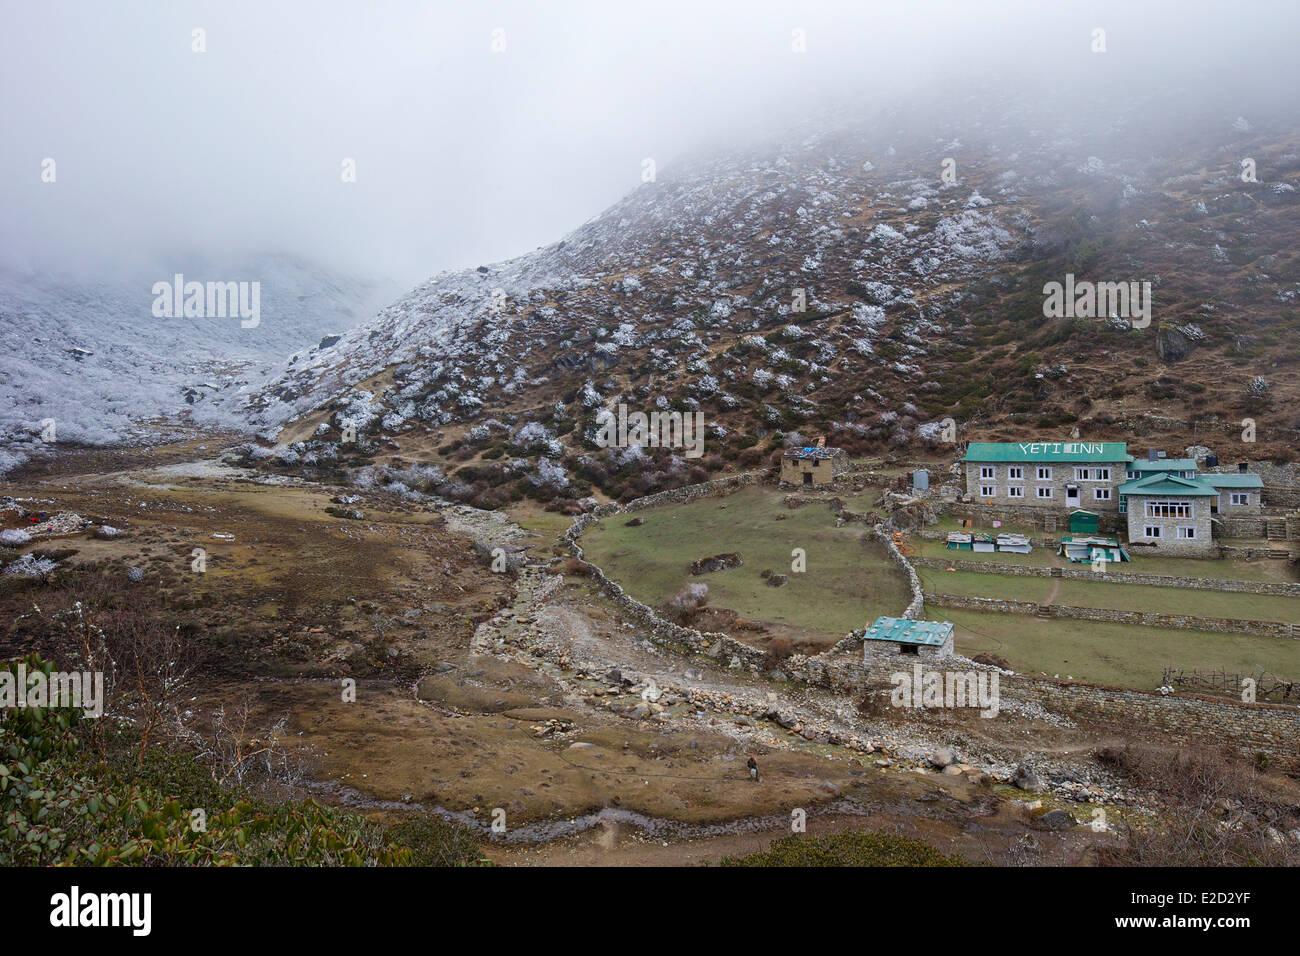 Yeti Inn at Dhole, Nepal, Asia - Stock Image